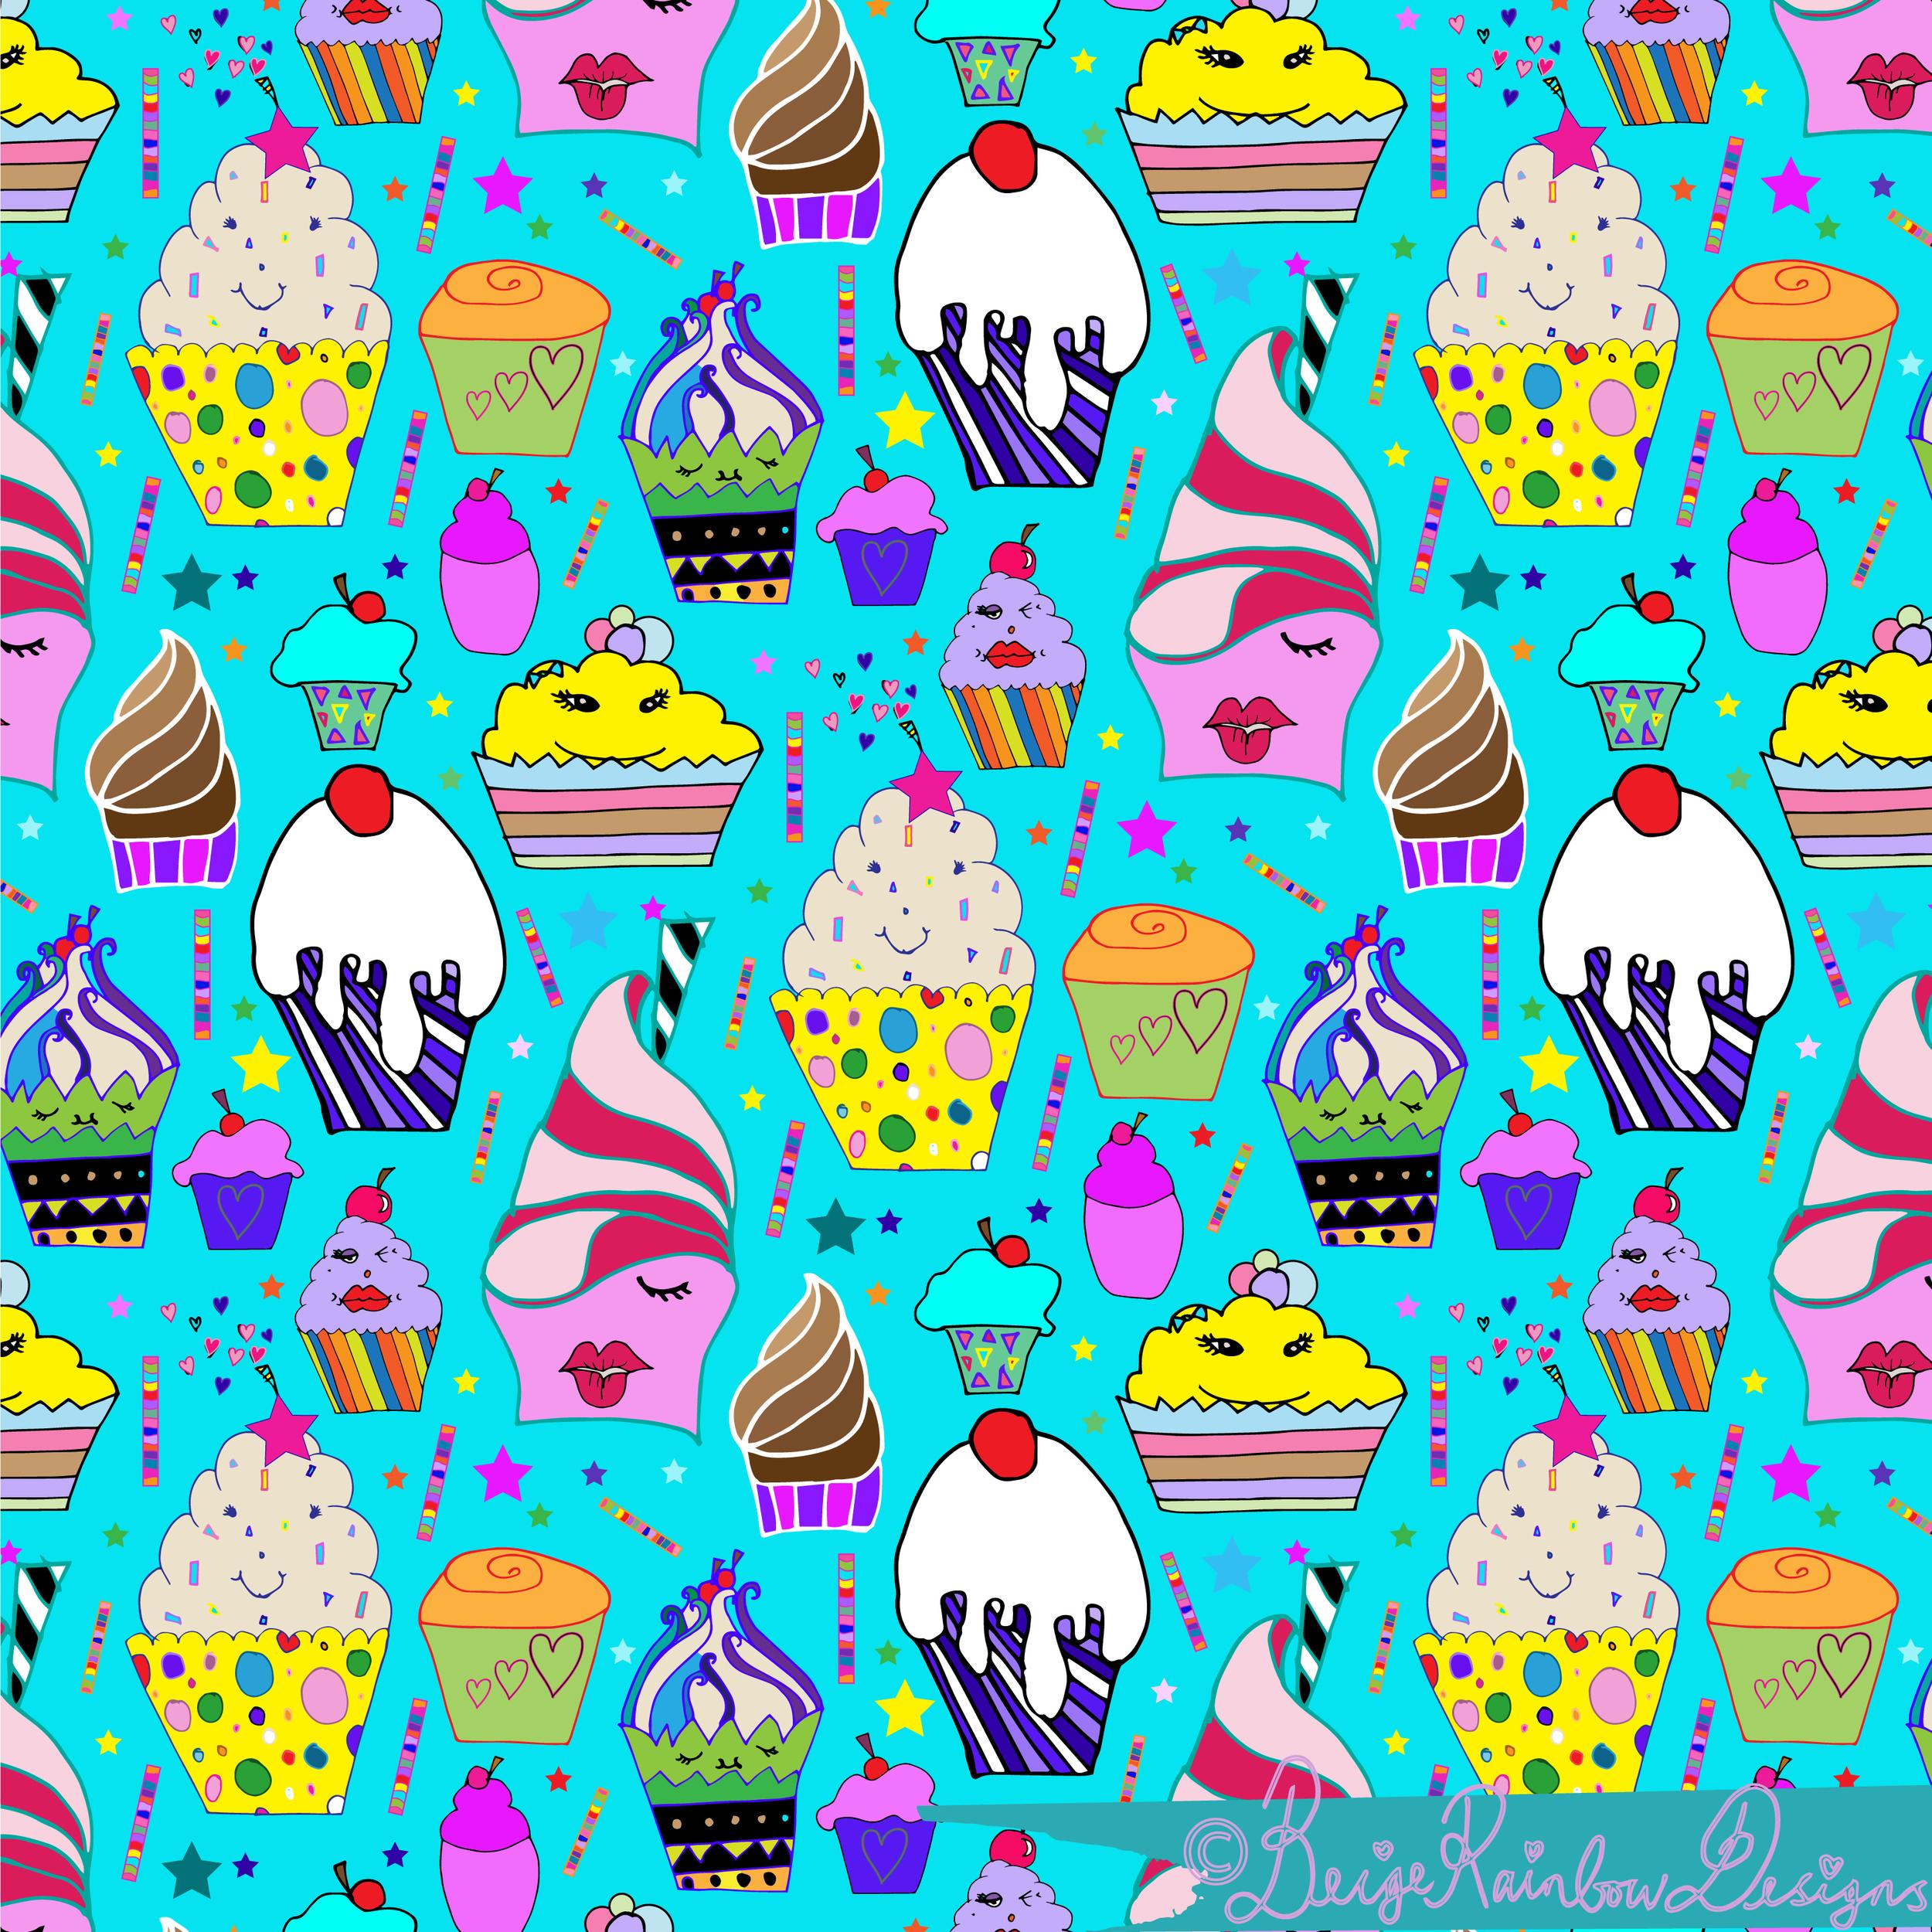 Cupcake-pattern-for-webby.jpg